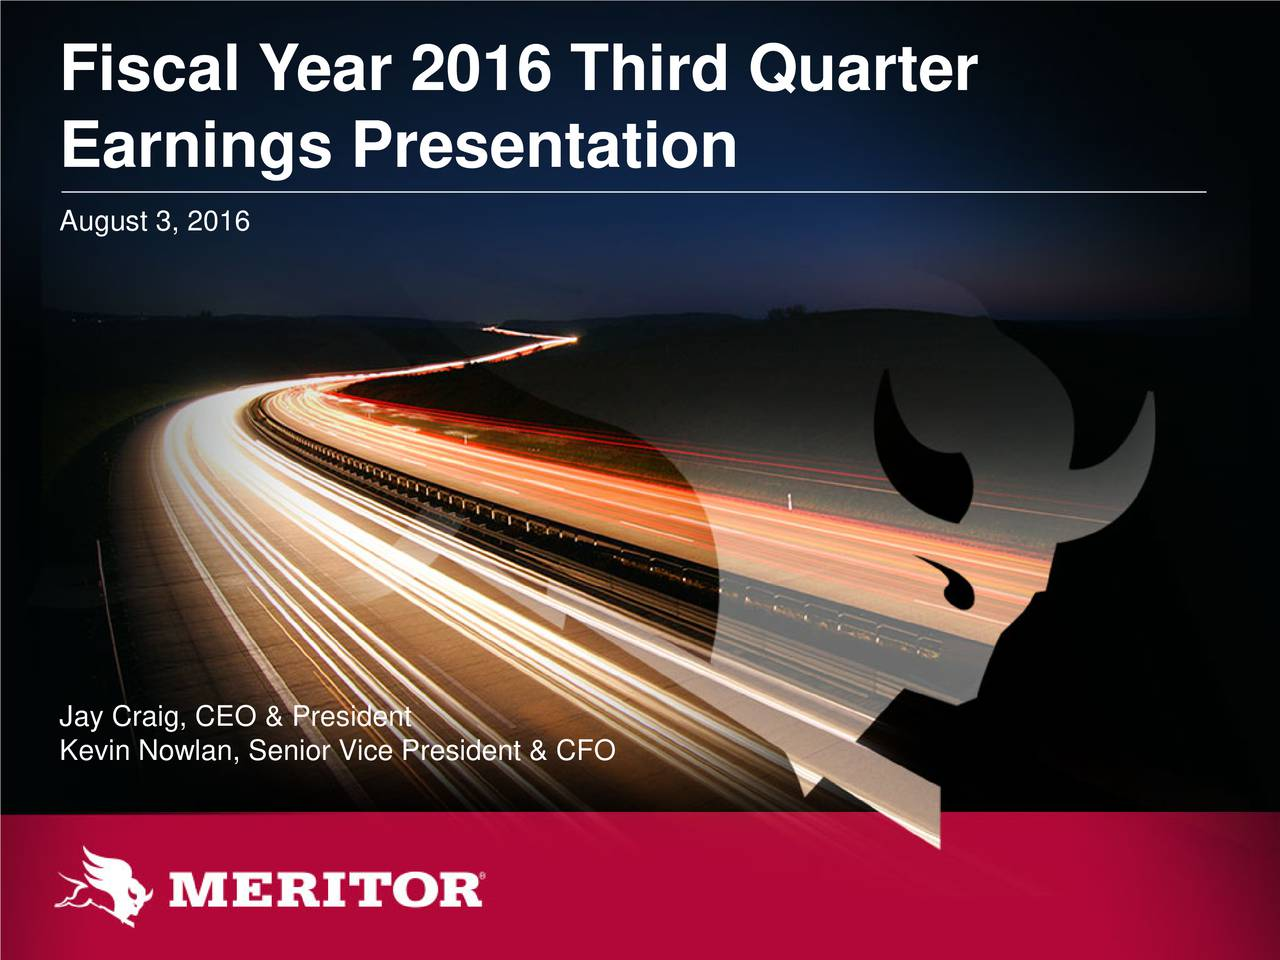 Earnings Presentation August 3, 2016 Jay Craig, CEO & President Kevin Nowlan, Senior Vice President & CFO